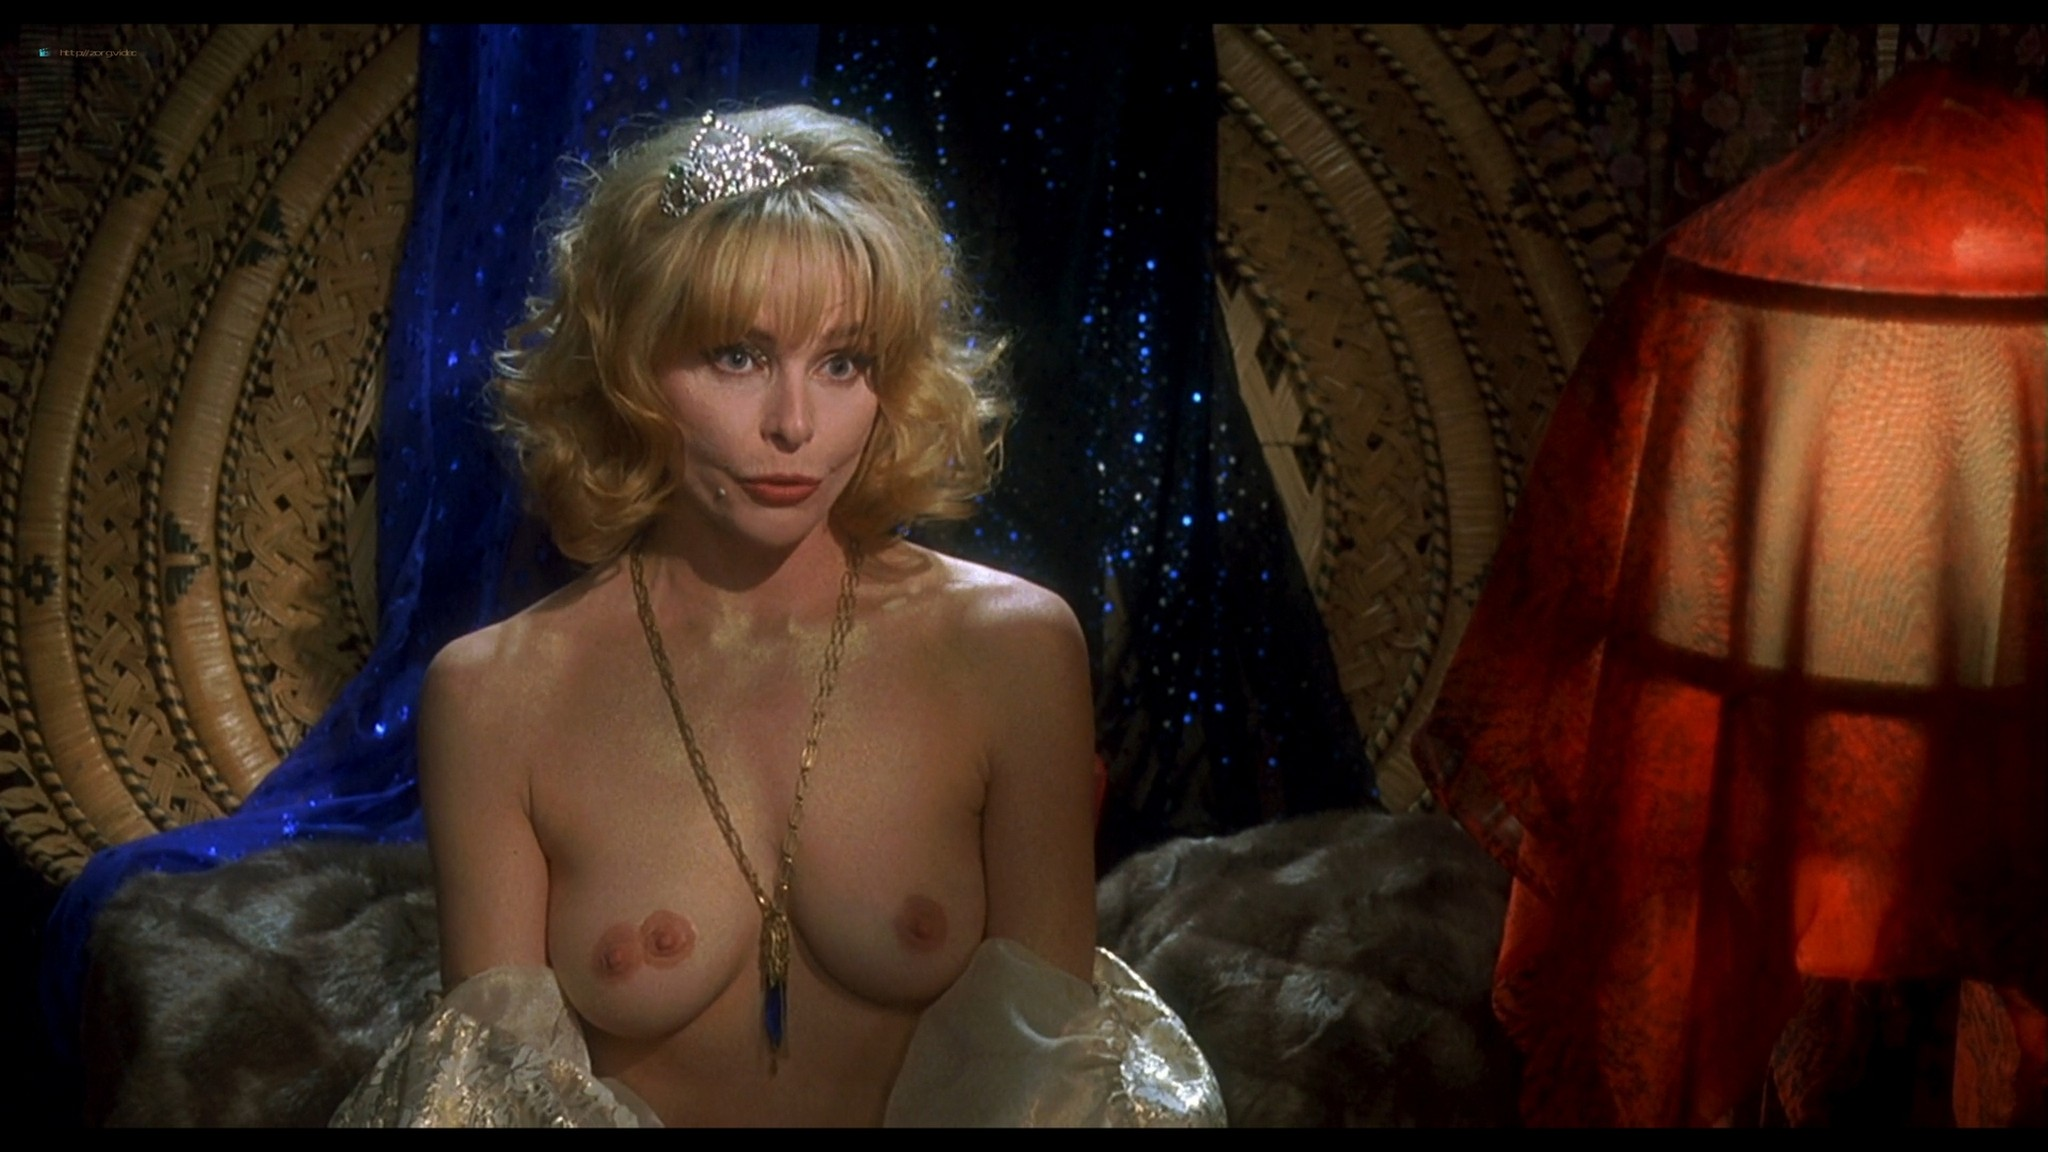 Joey Lauren Adams nude Priscilla Barnes nude topless - Mallrats (1995) HD 1080p BluRay (7)